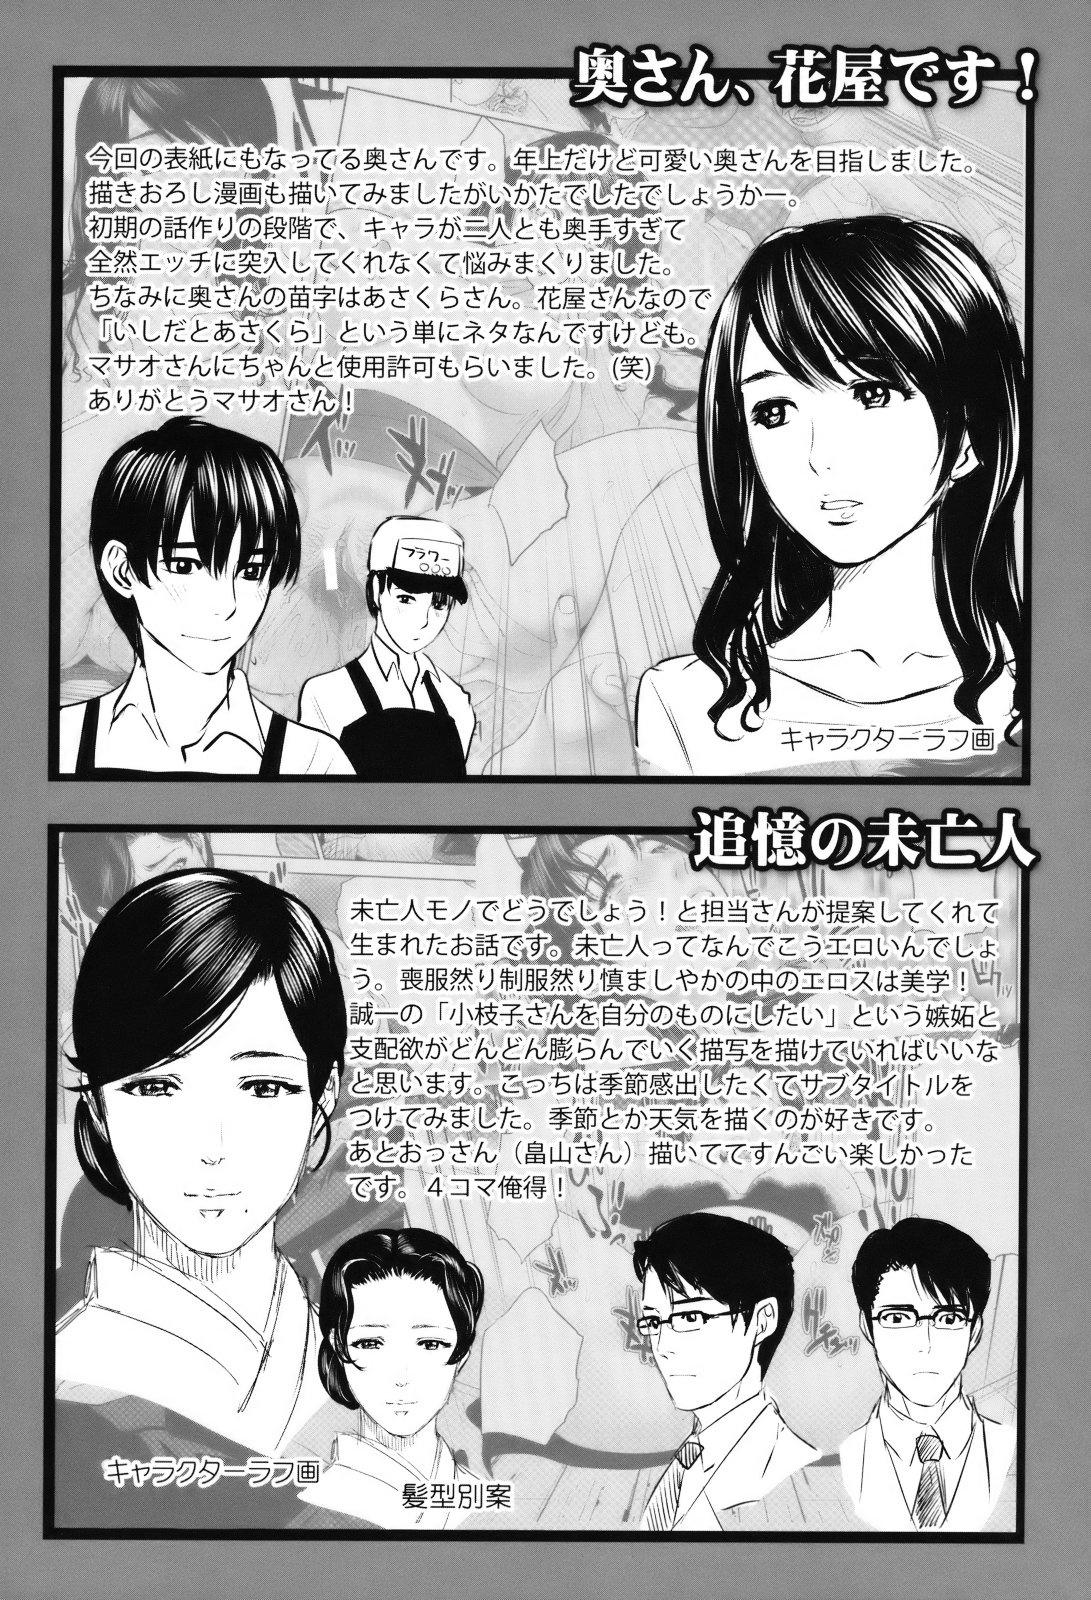 Okusan to Issho♥ | With a Married Woman♥ 219